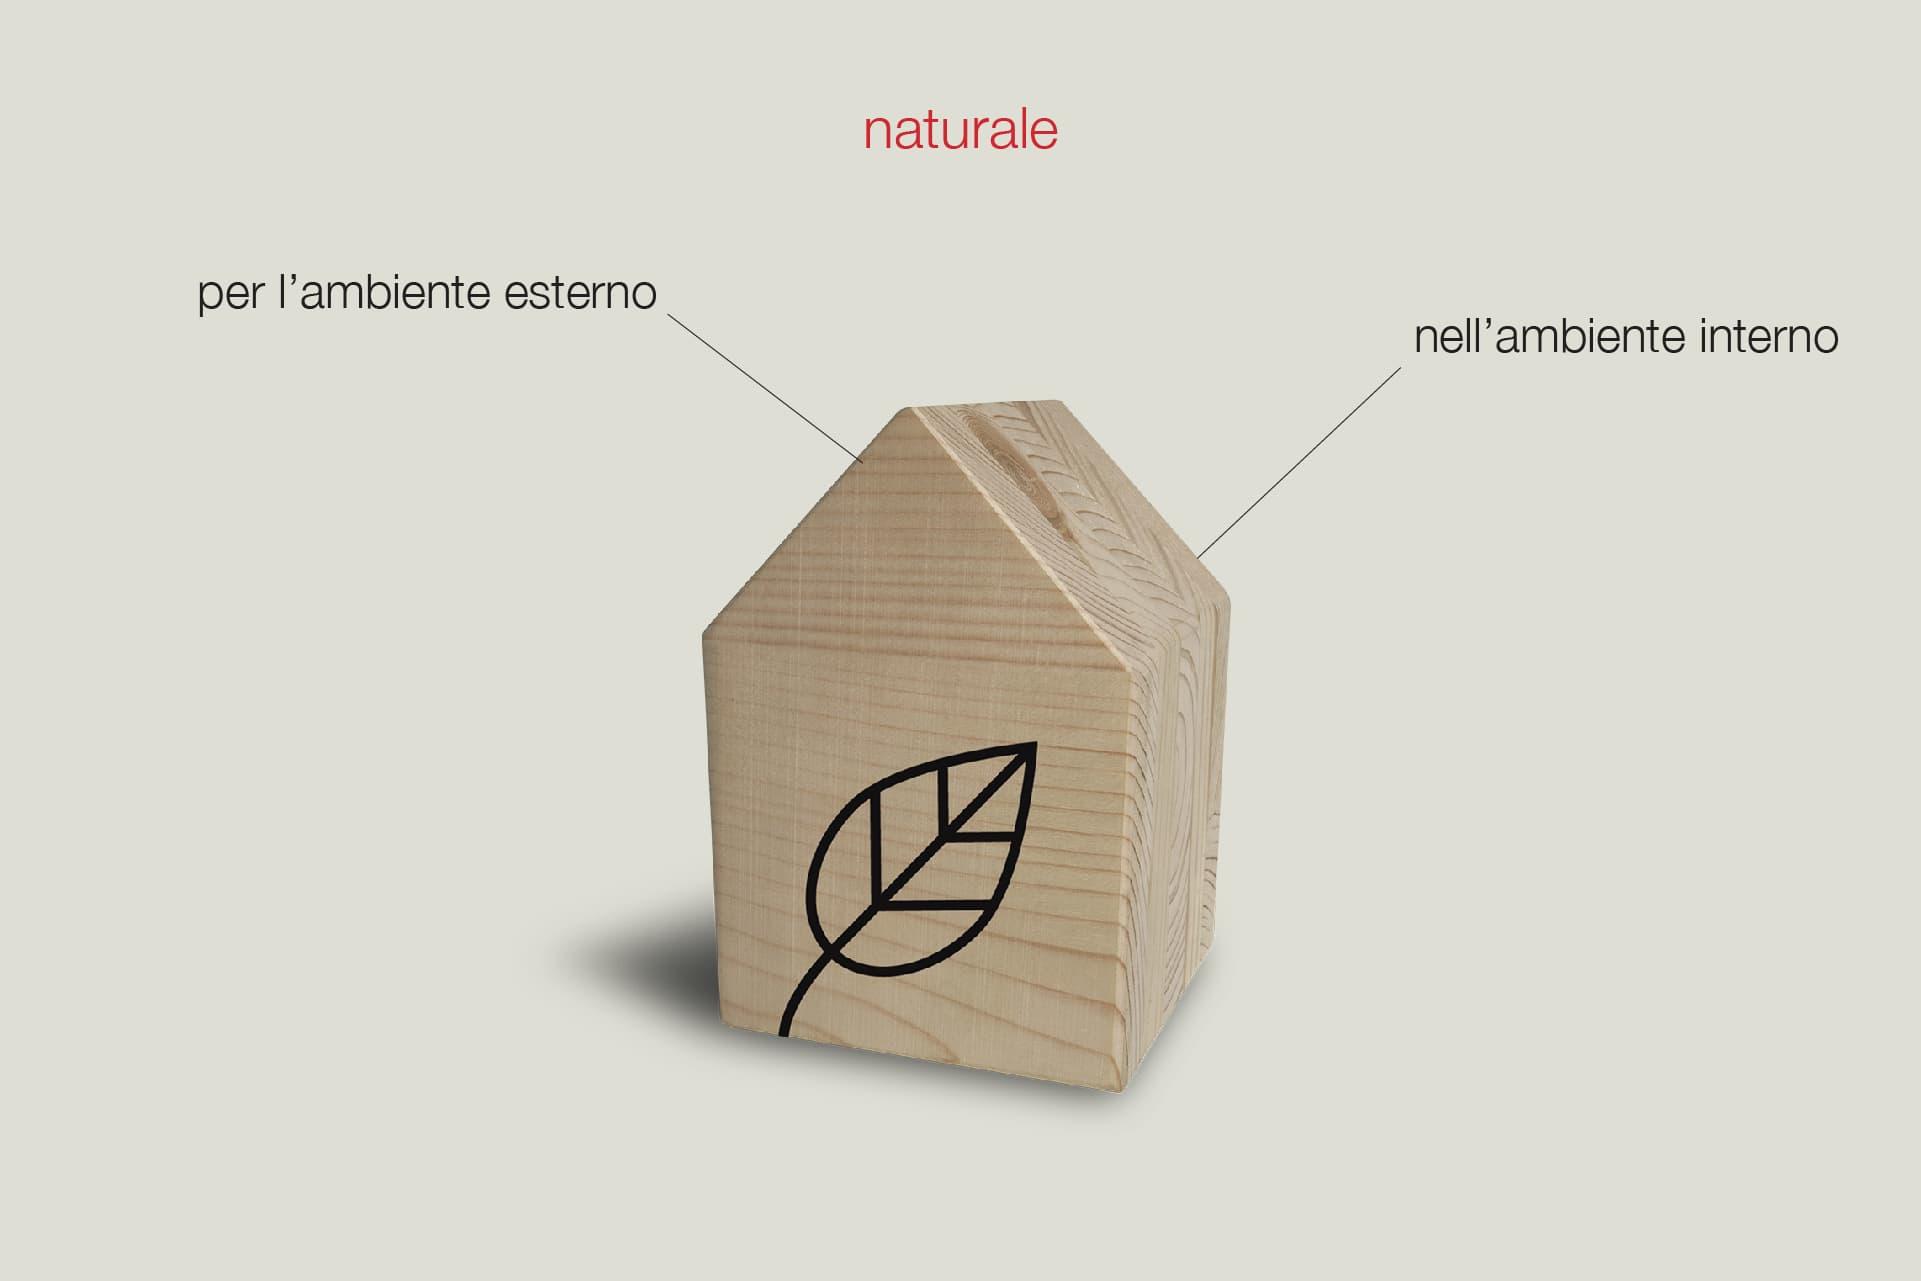 Klima Home Casa Naturale